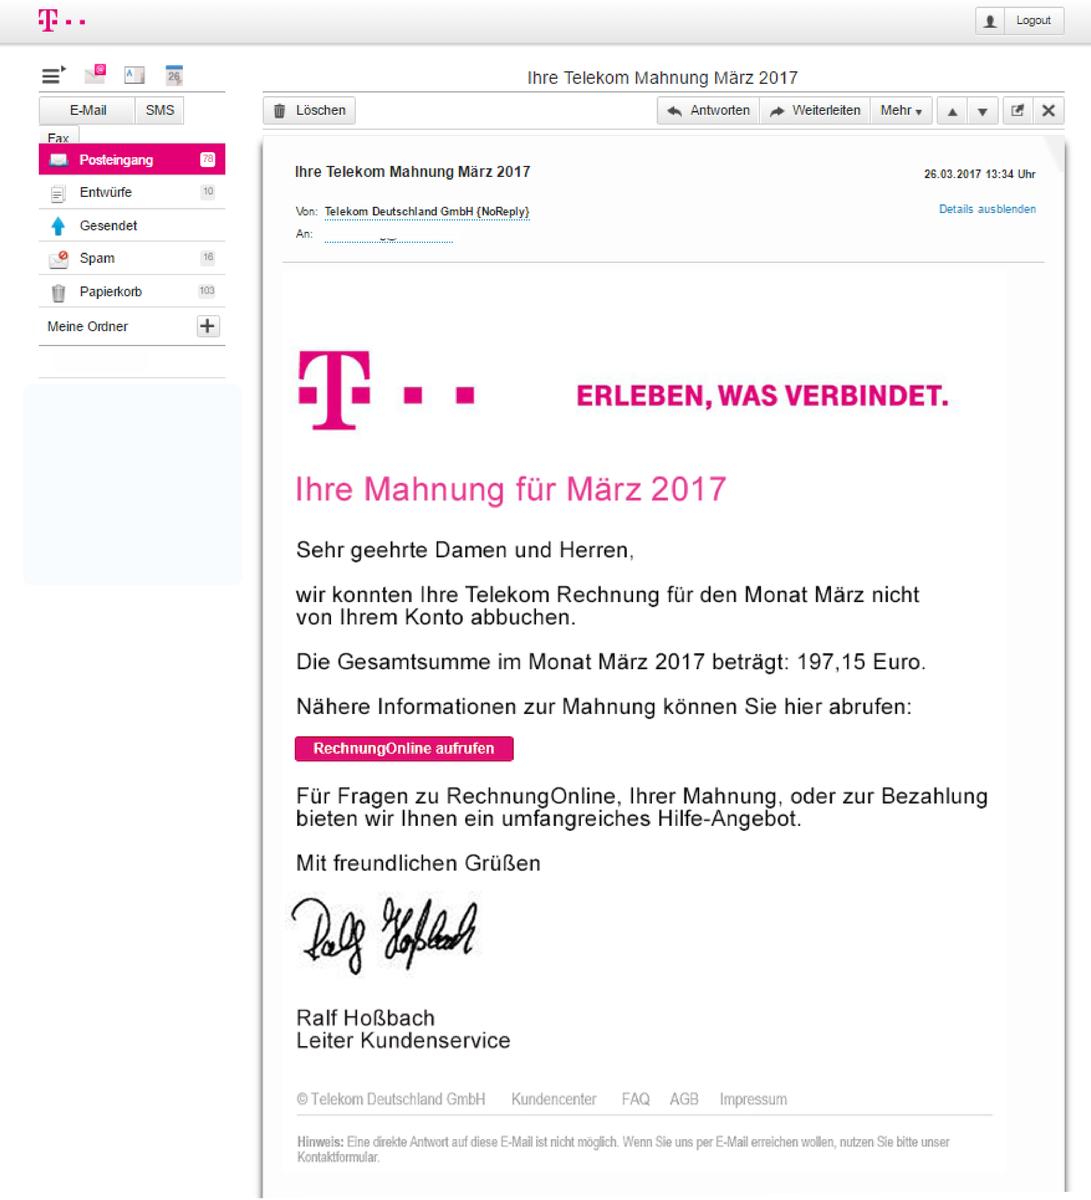 Fake Telekom Mahnung Fake Monheim Am Rhein